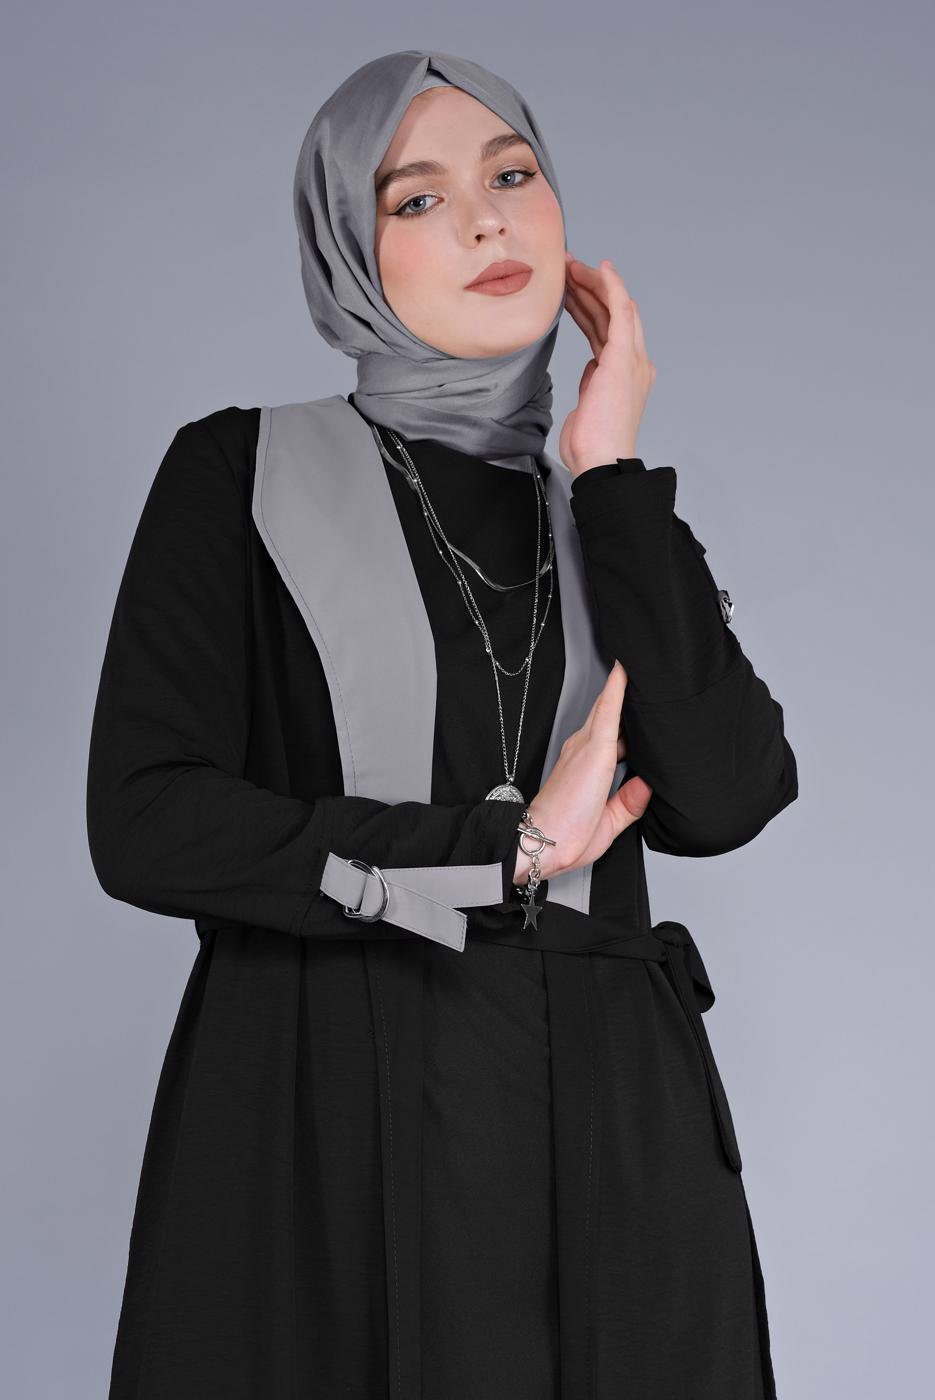 Bayan SİYAH KUŞAKLI İKİ RENKLİ TRENÇKOT 6365